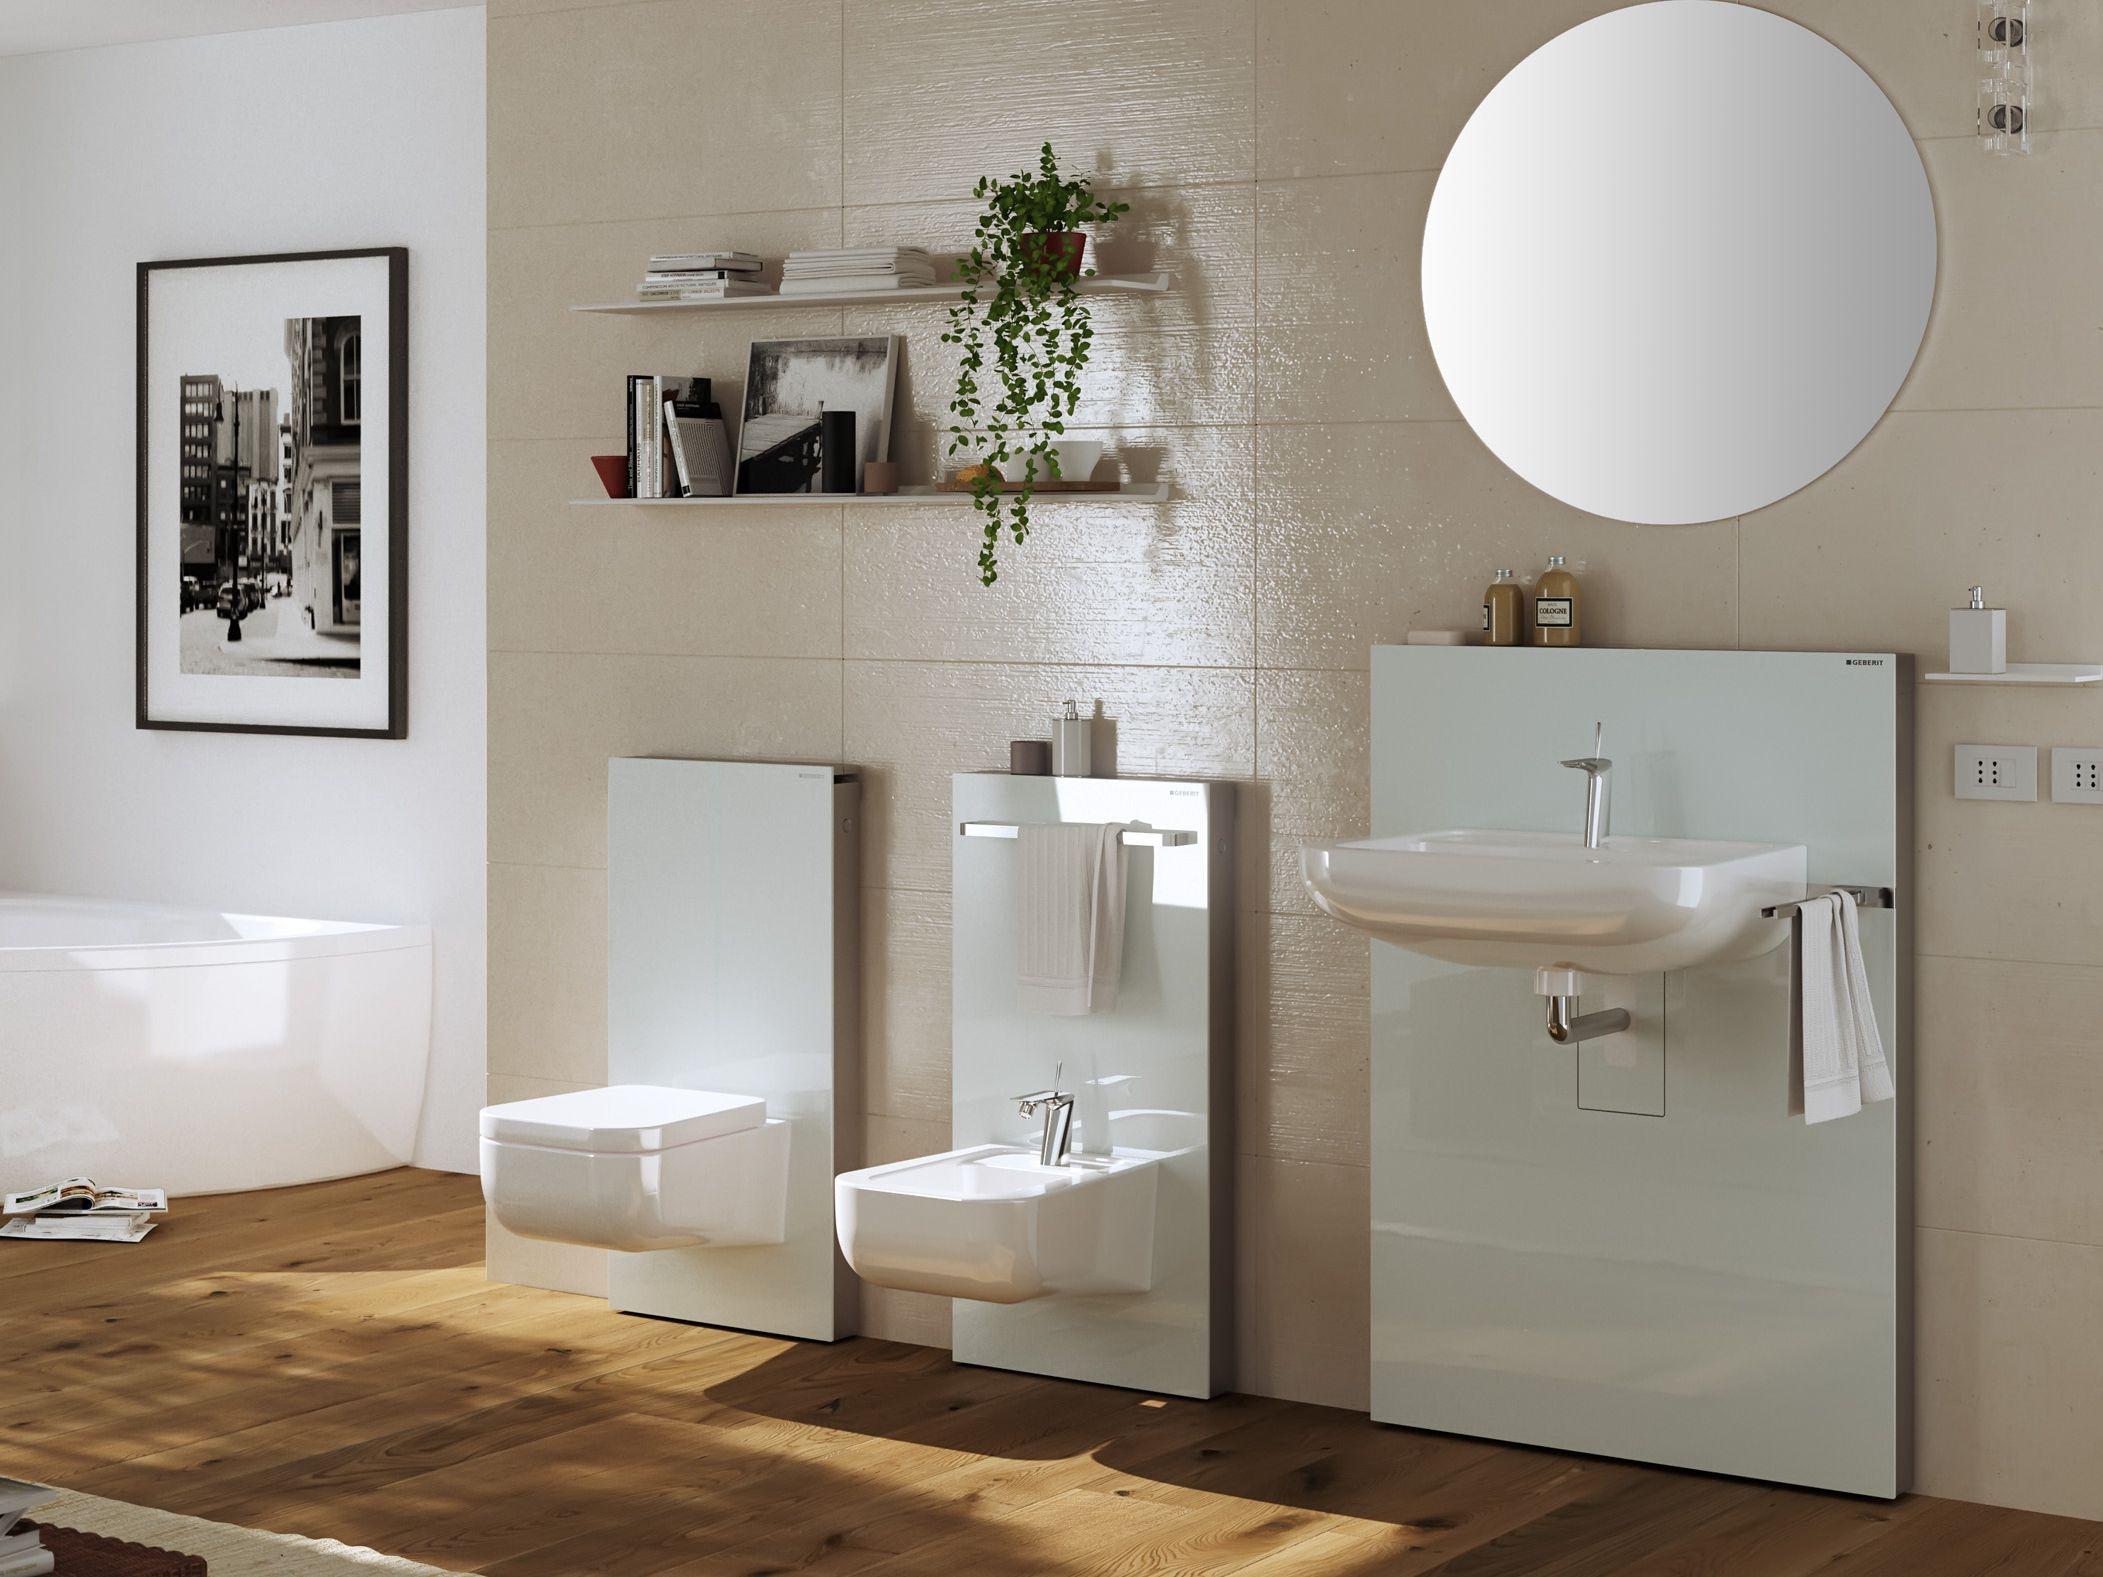 monolith sanit rmodul f r waschtisch by geberit italia. Black Bedroom Furniture Sets. Home Design Ideas